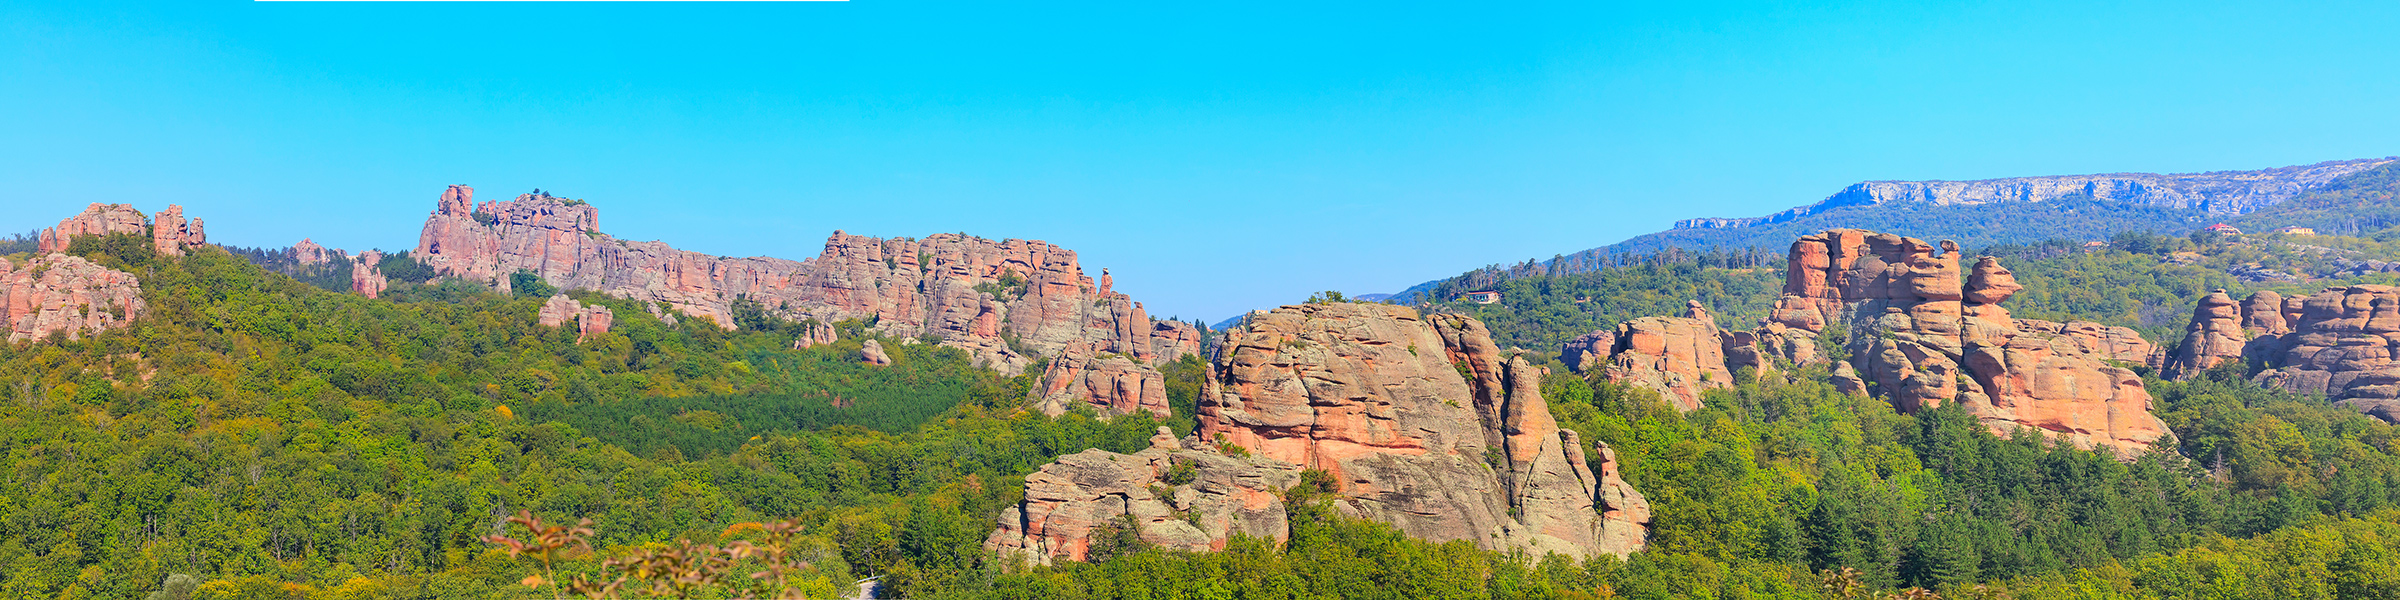 Bulgaria Belogradchik Rocks